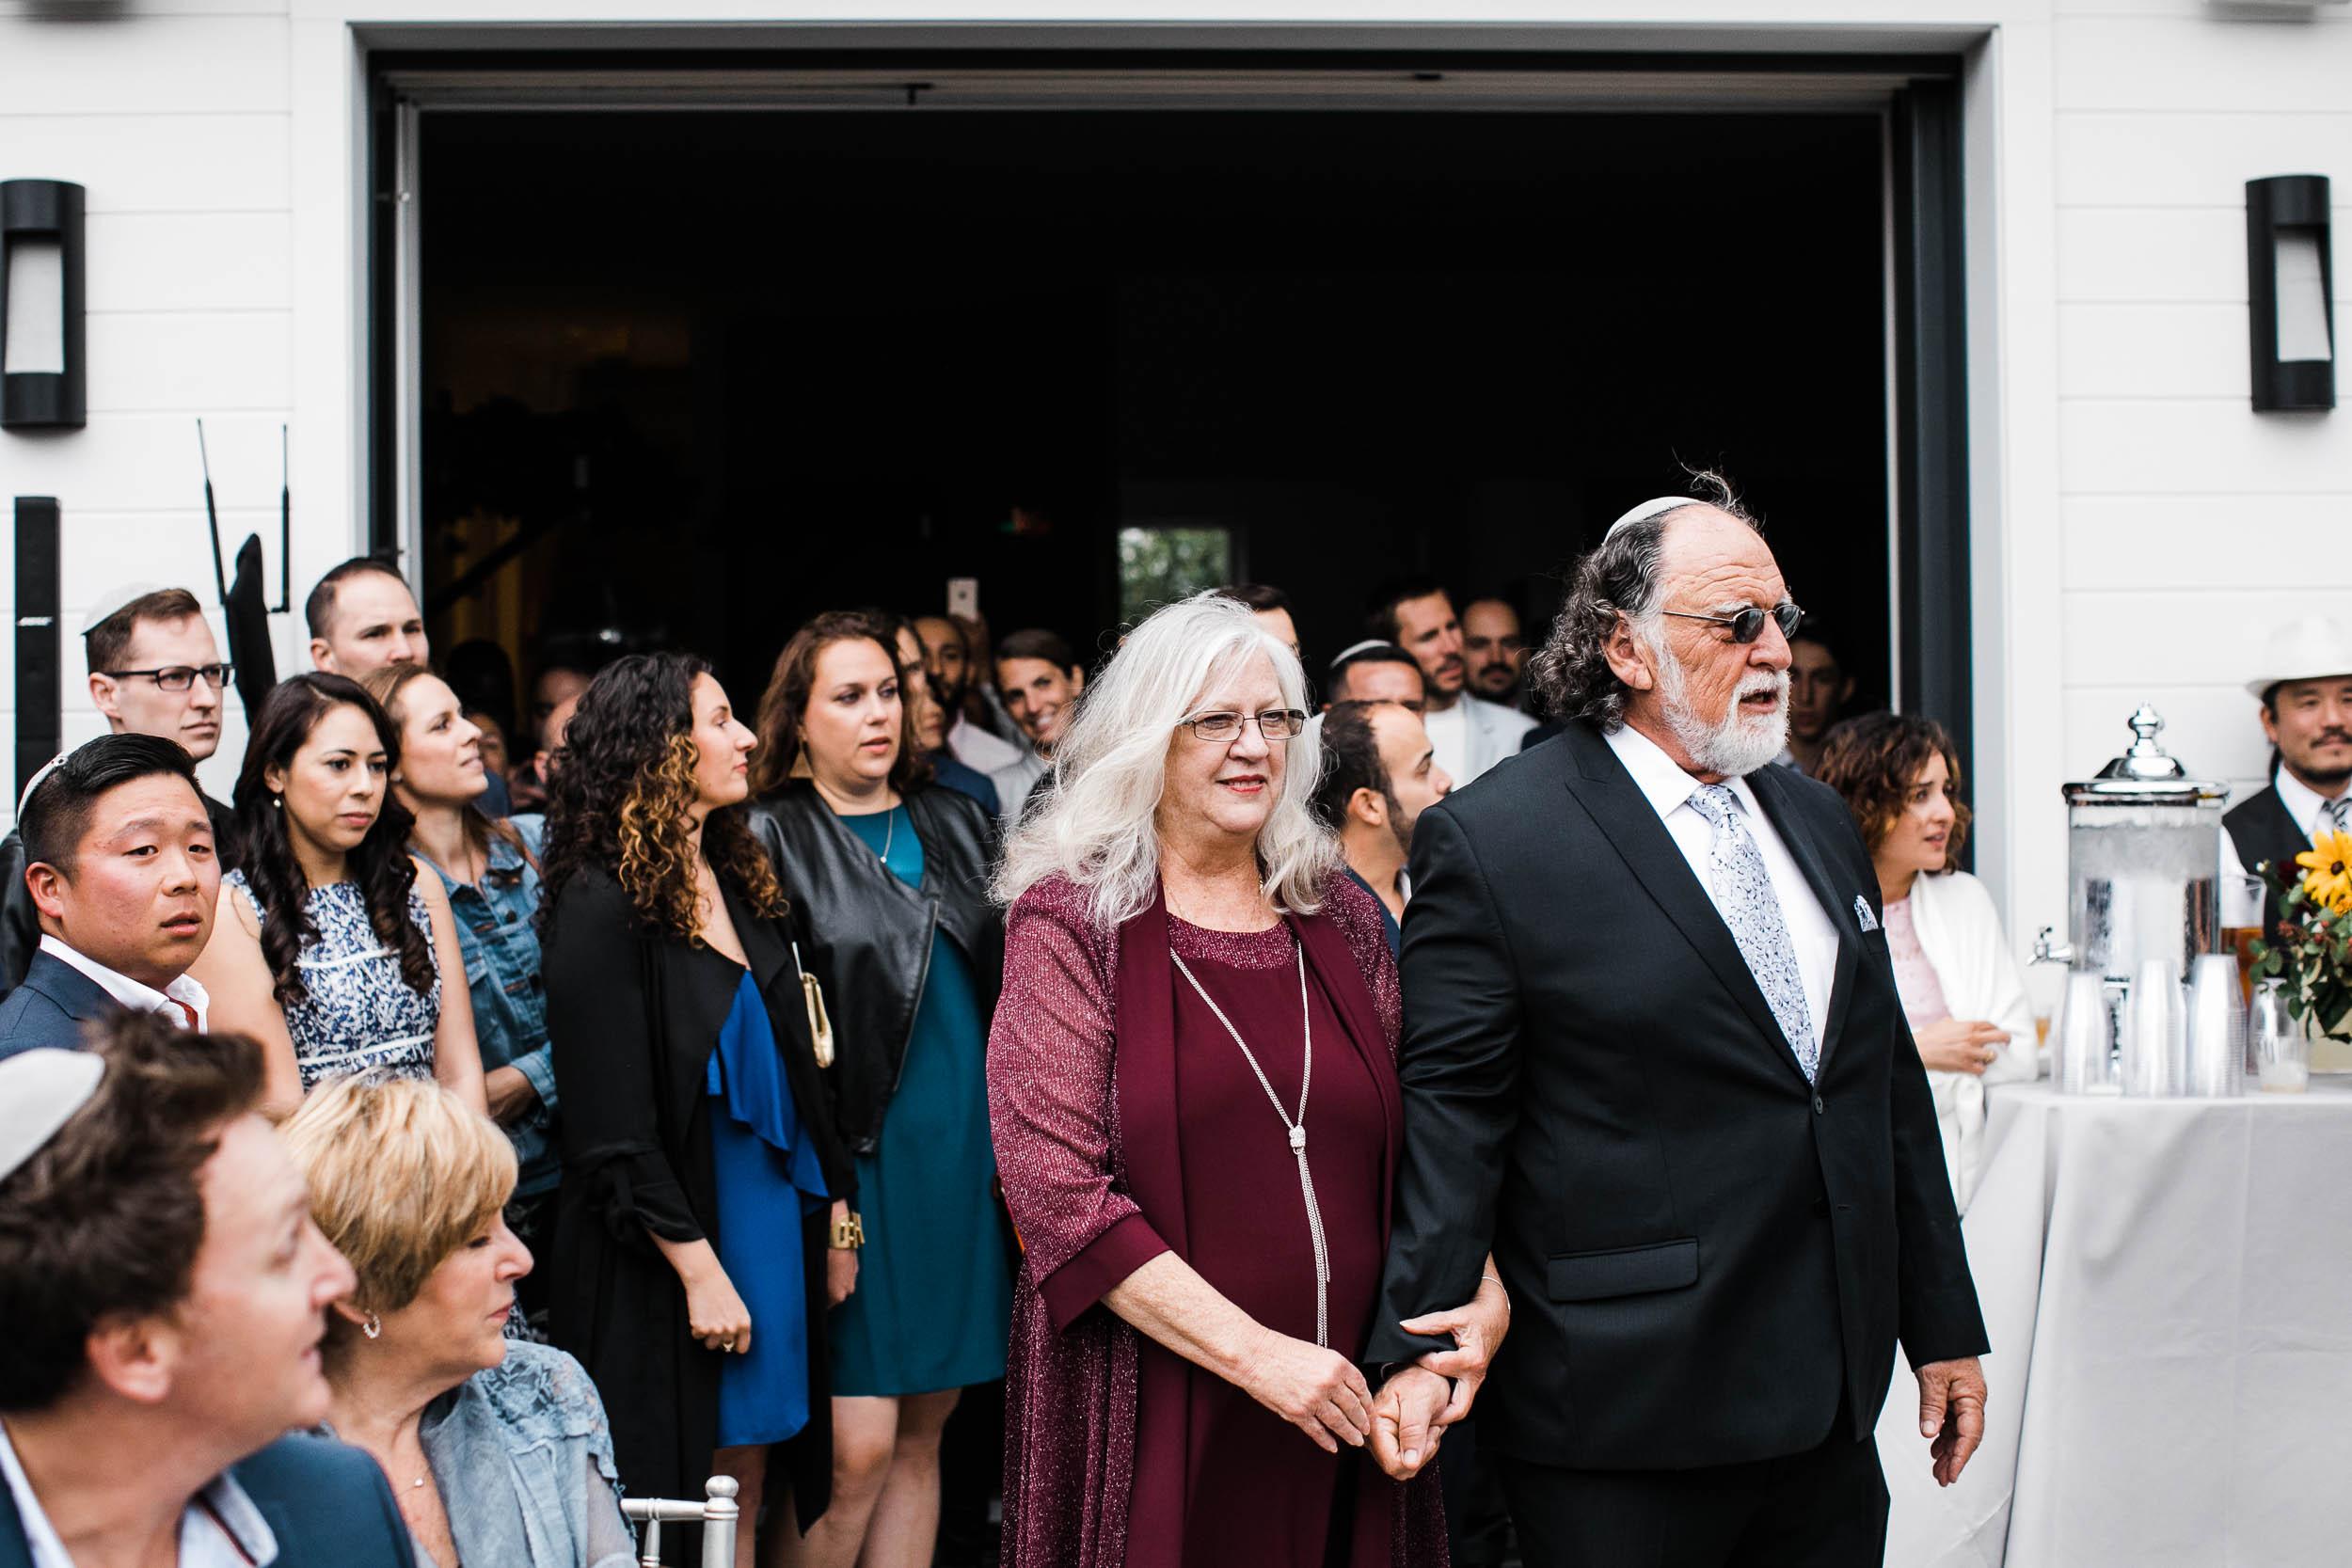 081818_Alina Jason San Francisco Wedding_Buena Lane Photography_1042 copy.jpg